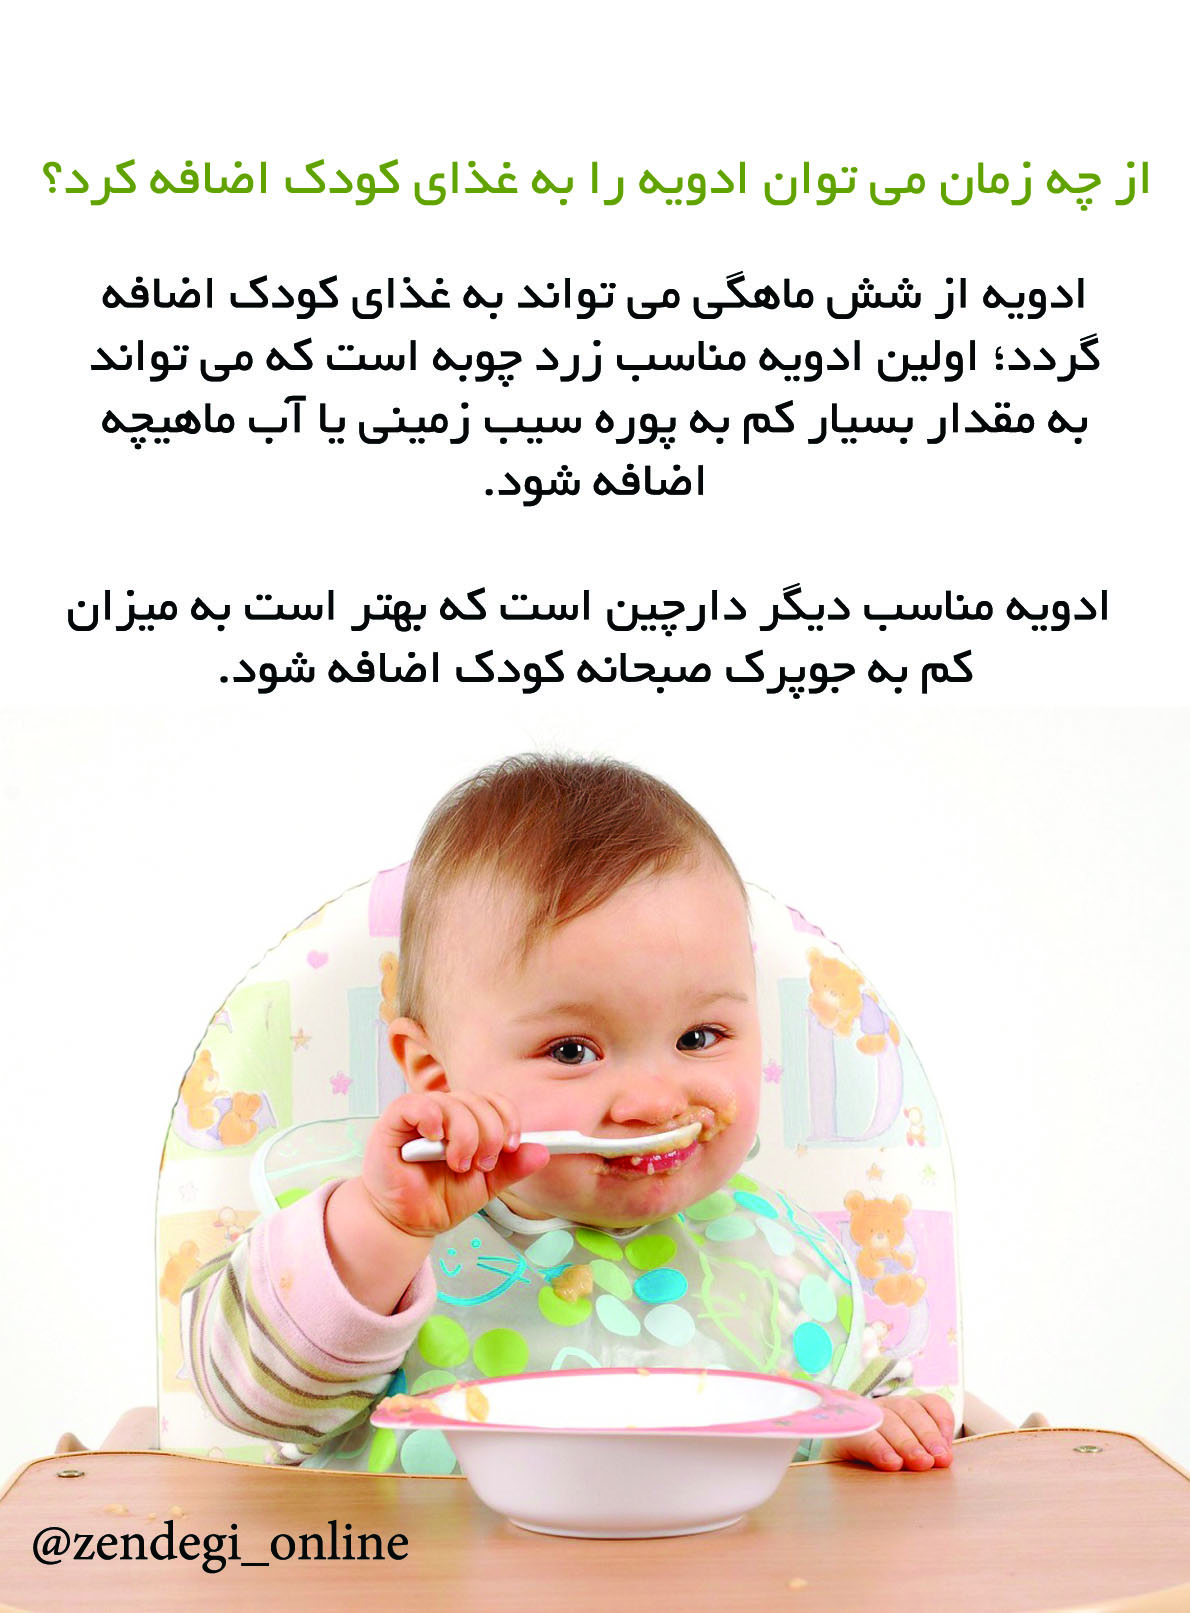 u5fl_ادویه_به_کودک.jpg